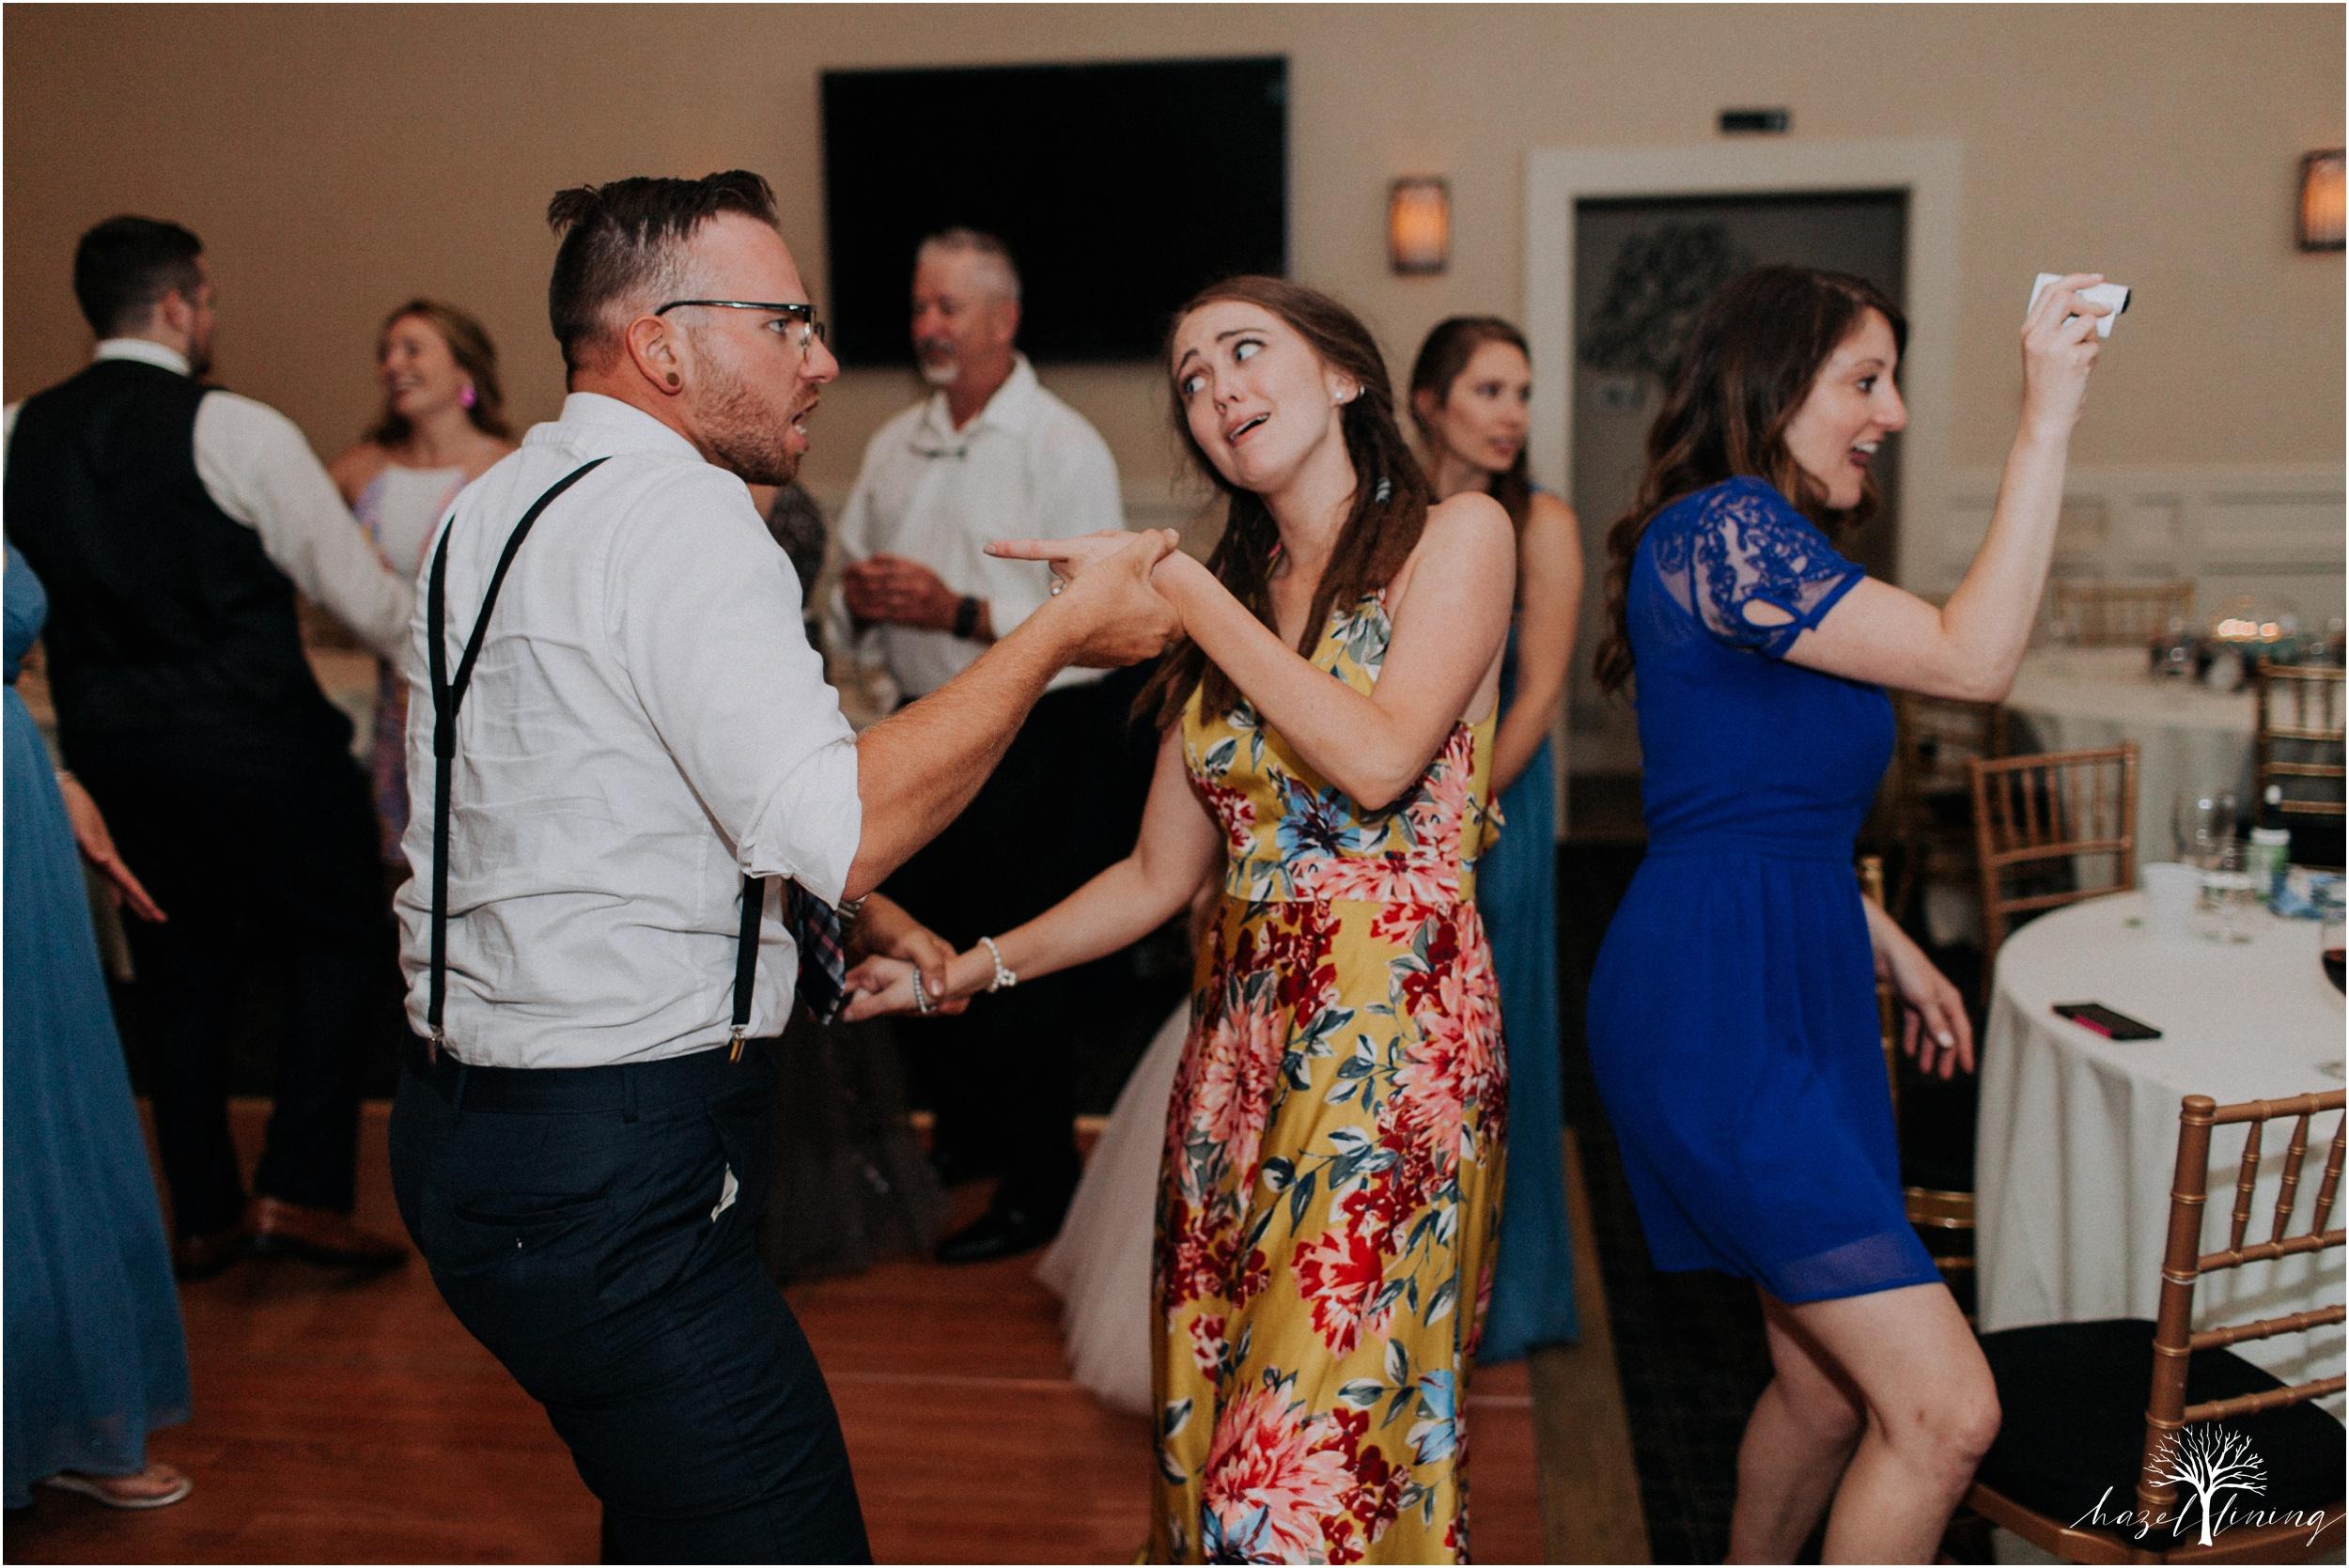 alyssa-james-stiteler-wedding-loft-and-sweet-water-cc-pennsburg-pennsylvania-hazel-lining-travel-wedding-elopement-photography_0153.jpg